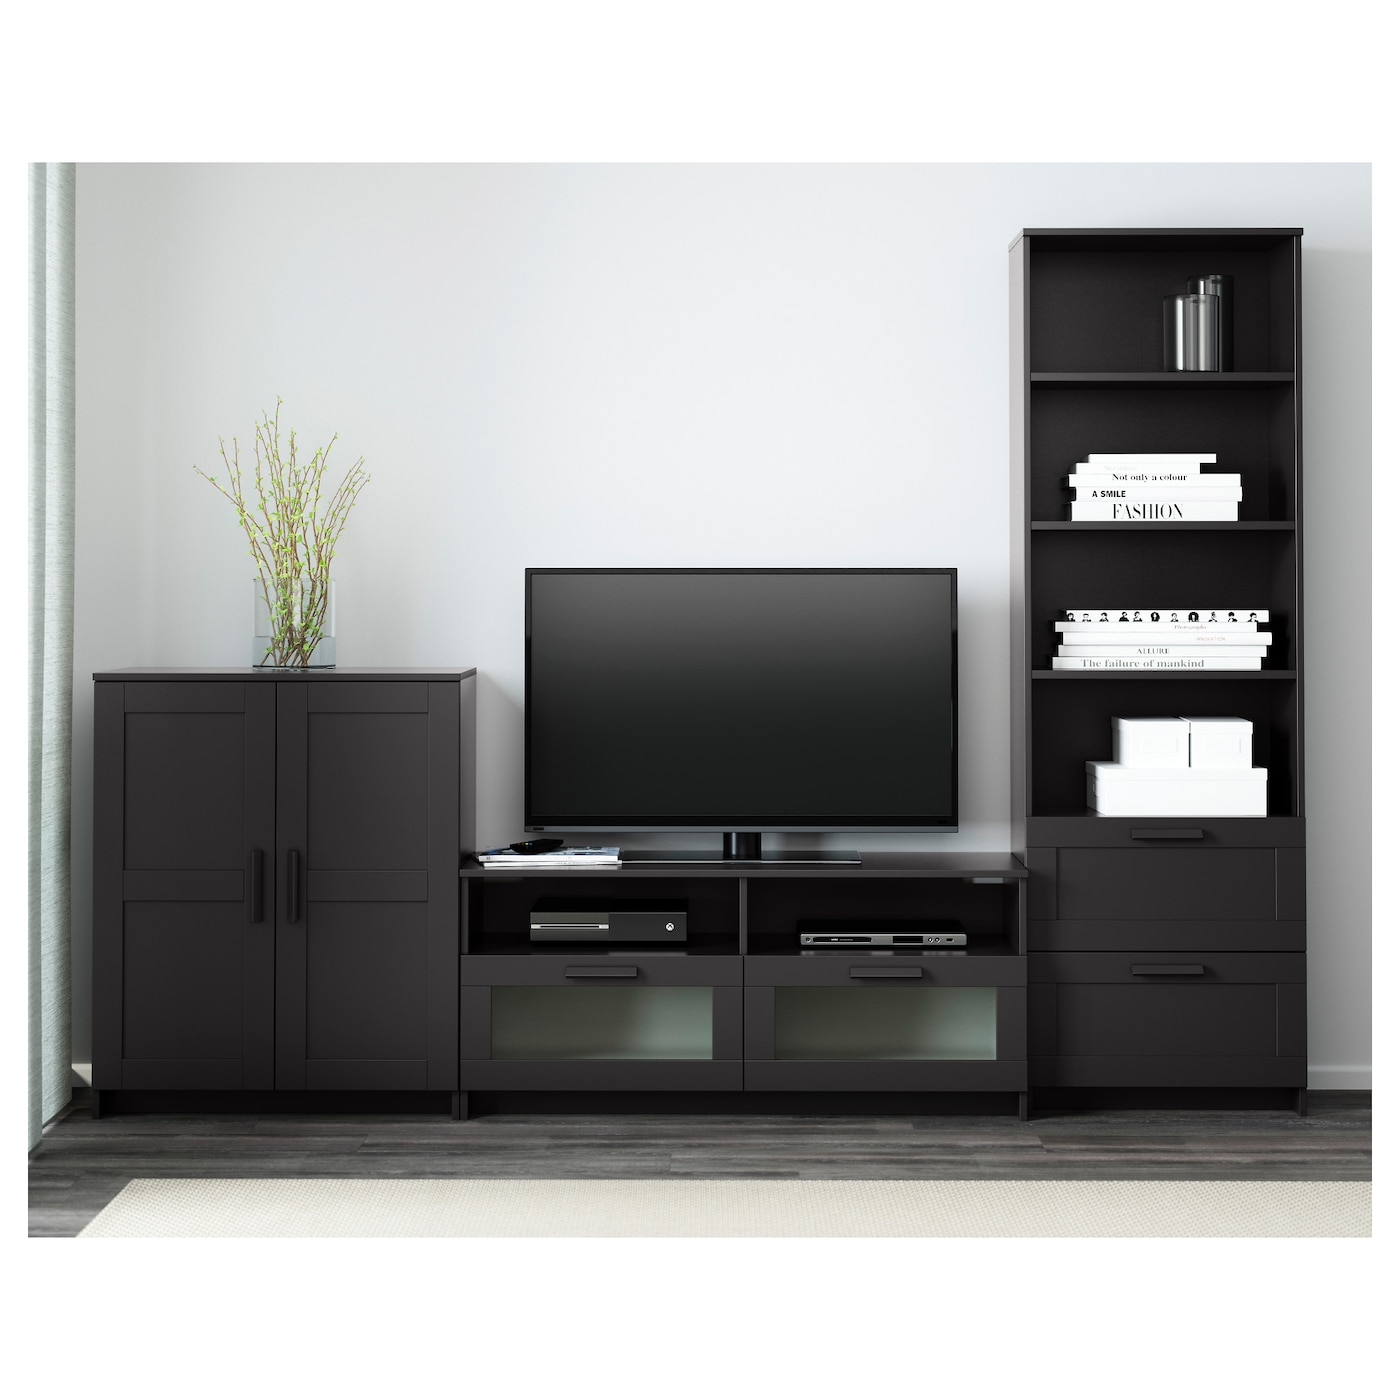 Brimnes Combinaison Meuble Tv Noir 258x41x190 Cm Ikea # Meuble Tv Bibliotheque Ikea